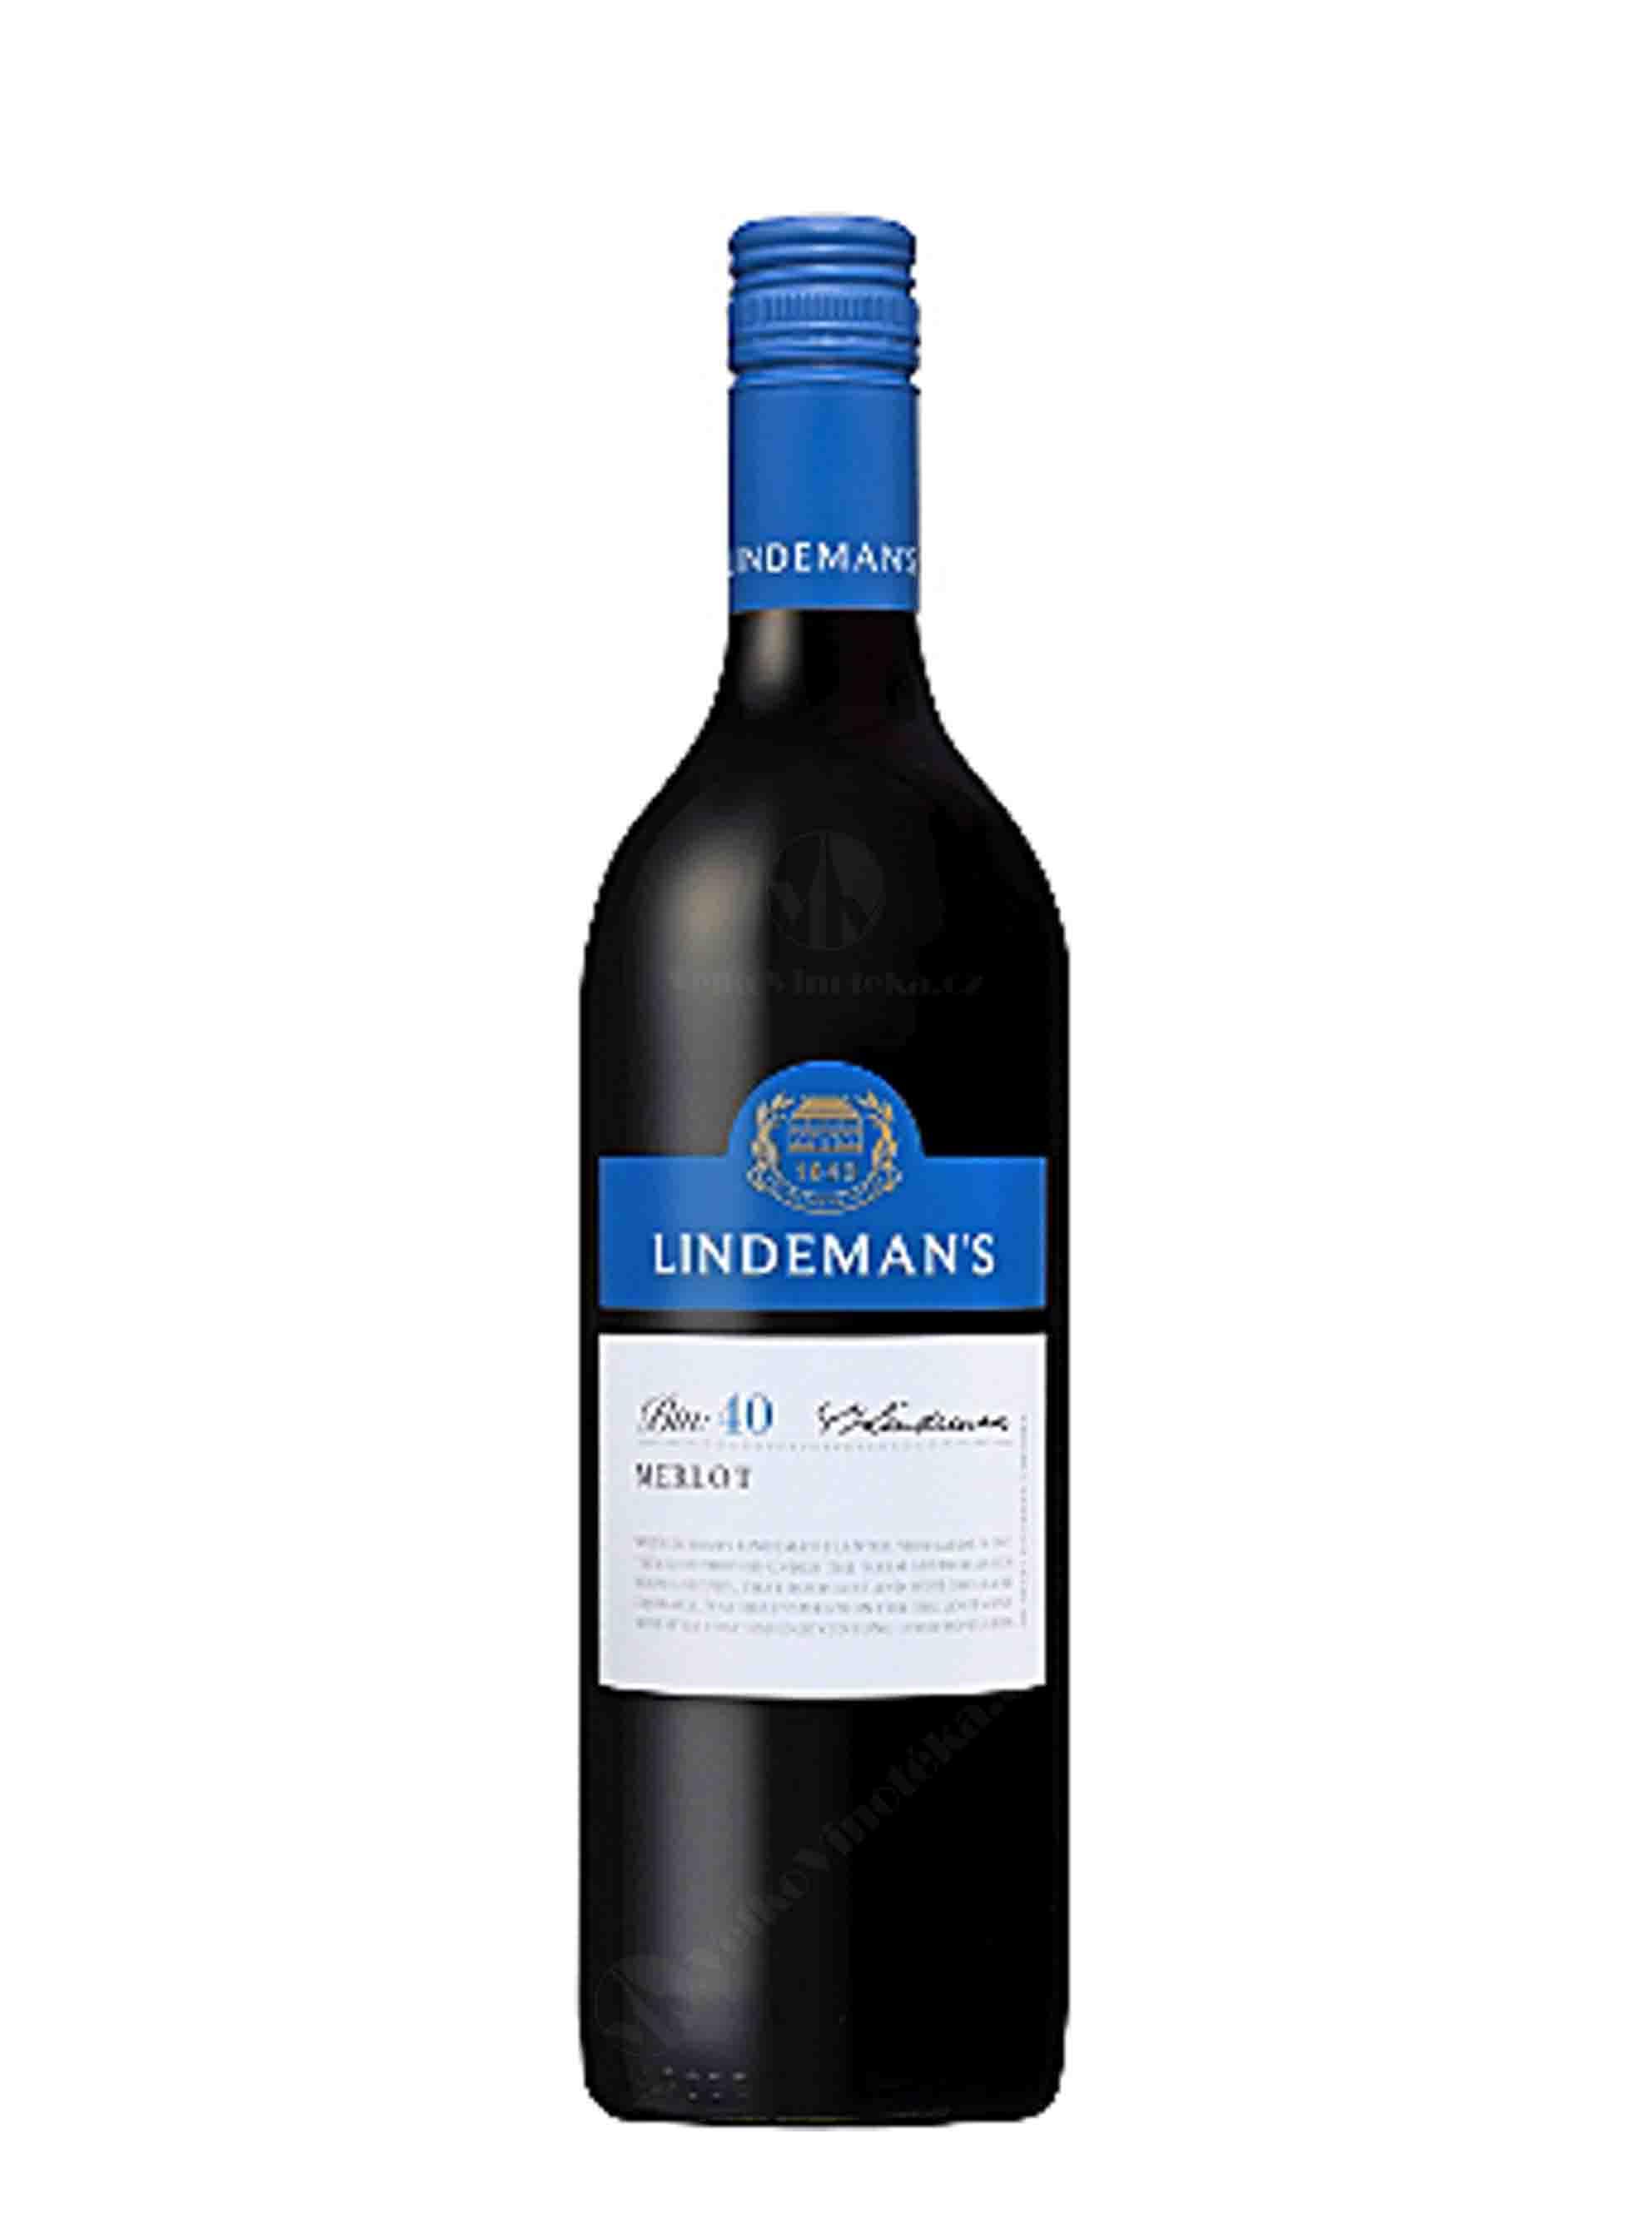 Merlot, Bin 40, 2015, Lindeman's, 0.75 l